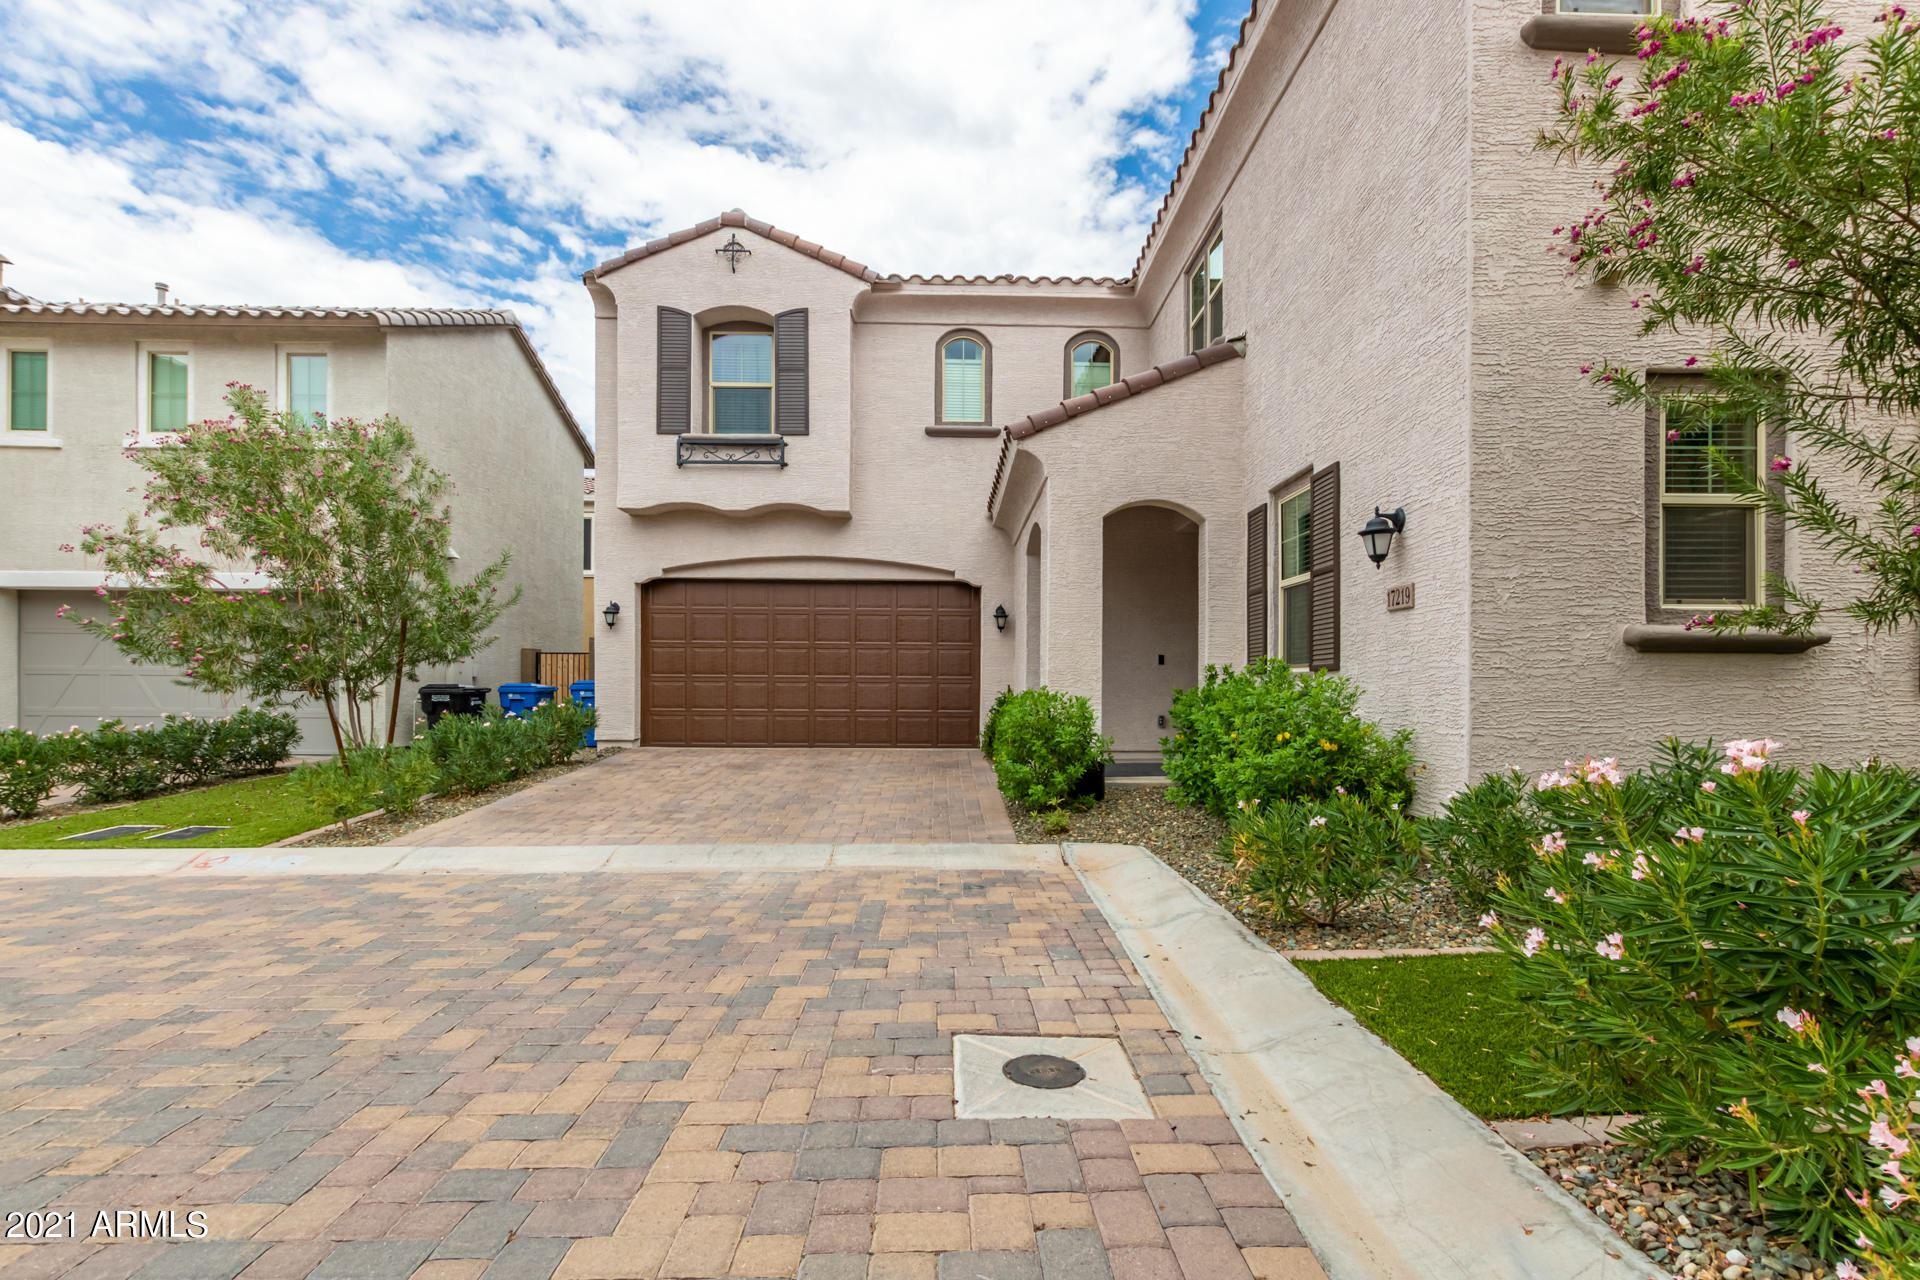 17219 N 10TH Street, Phoenix, AZ 85022 - MLS#: 6272015